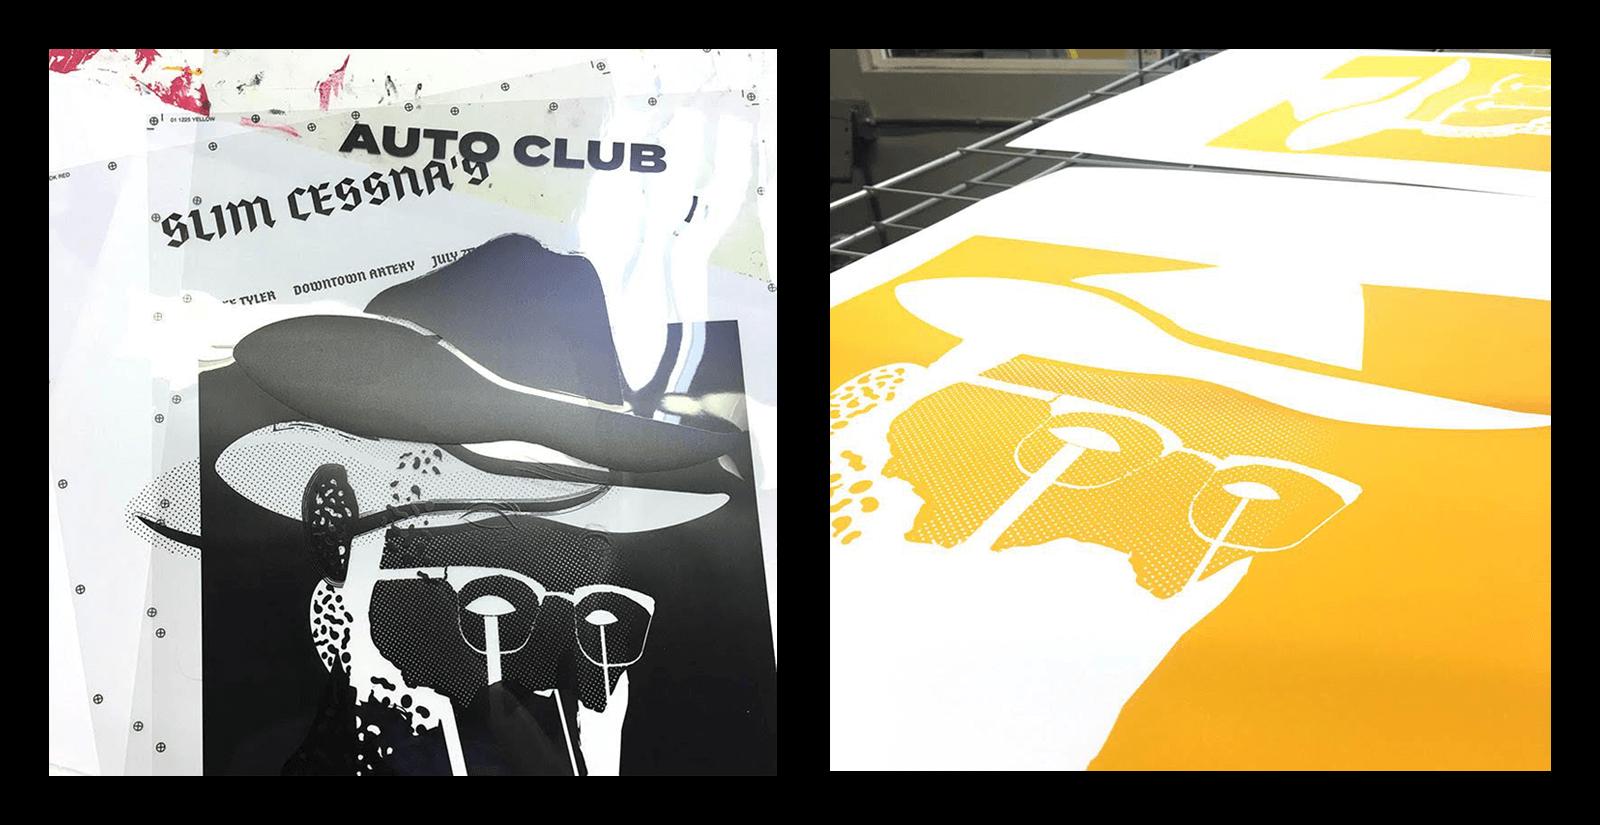 Slim Cessna's Auto Club Poster WIP